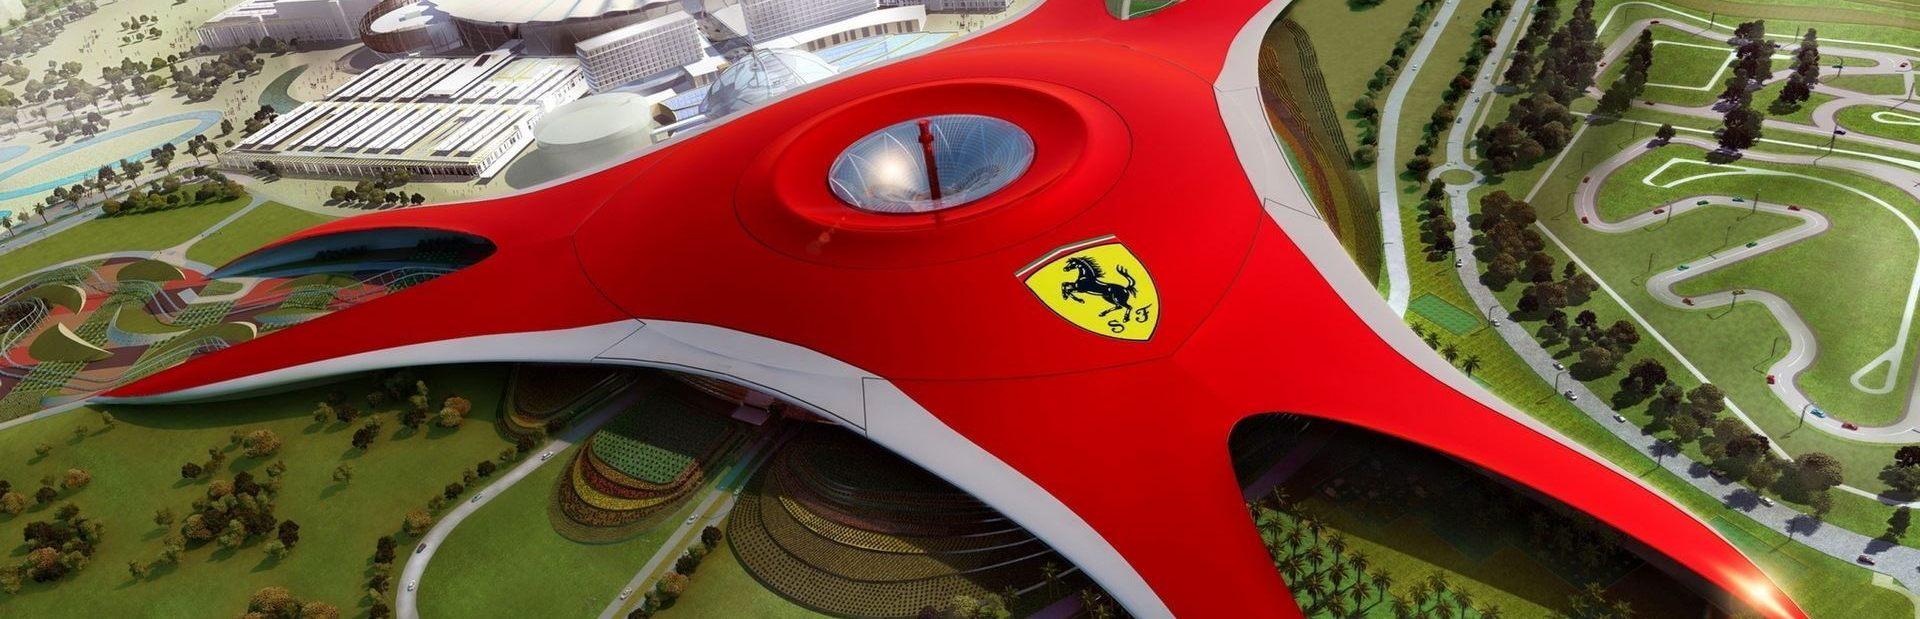 Ferrari World Image 1